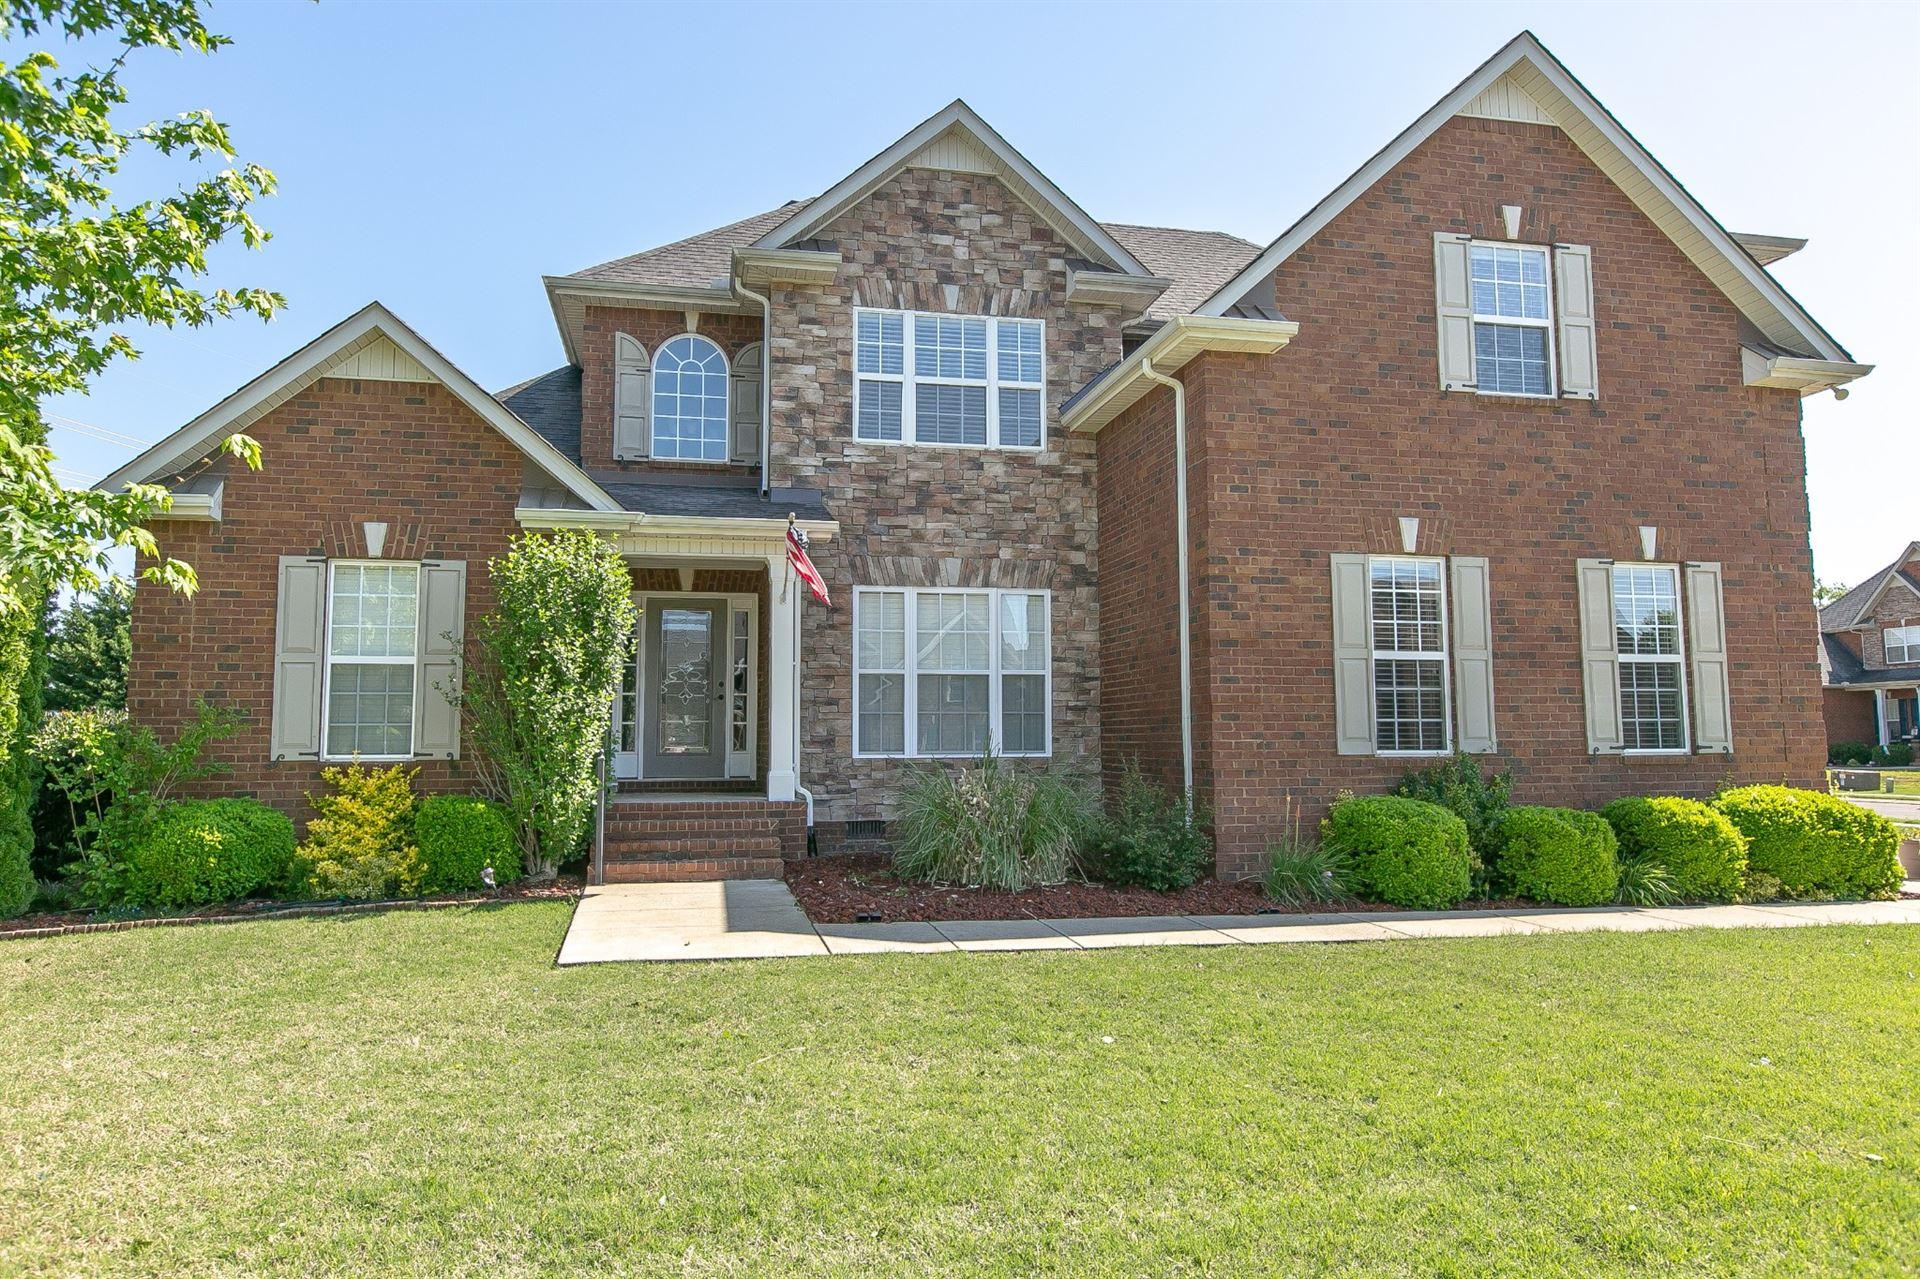 2733 Presley Drive, Murfreesboro, TN 37128 - MLS#: 2251564